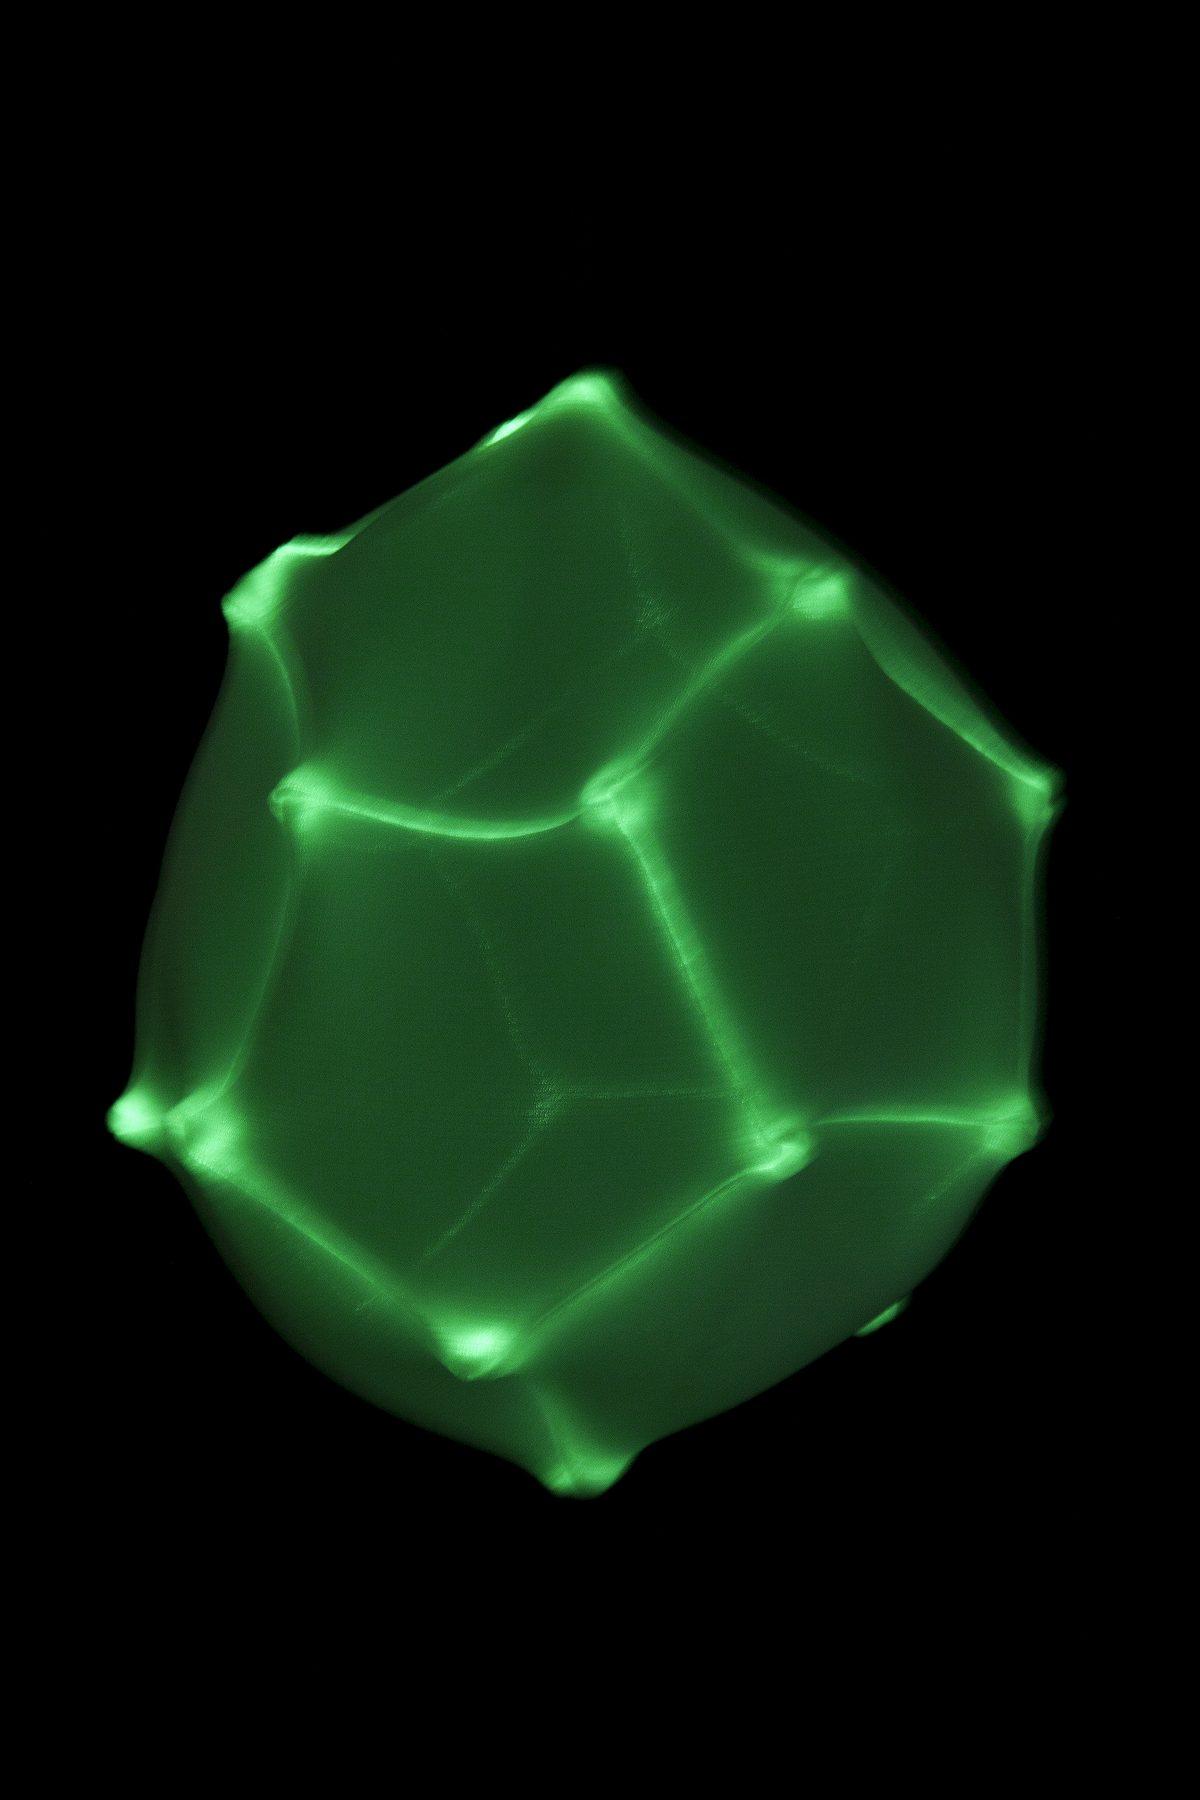 Radiolaria Pseudoglobulus footballi glow-in-the-dark hanglamp van Bernotat